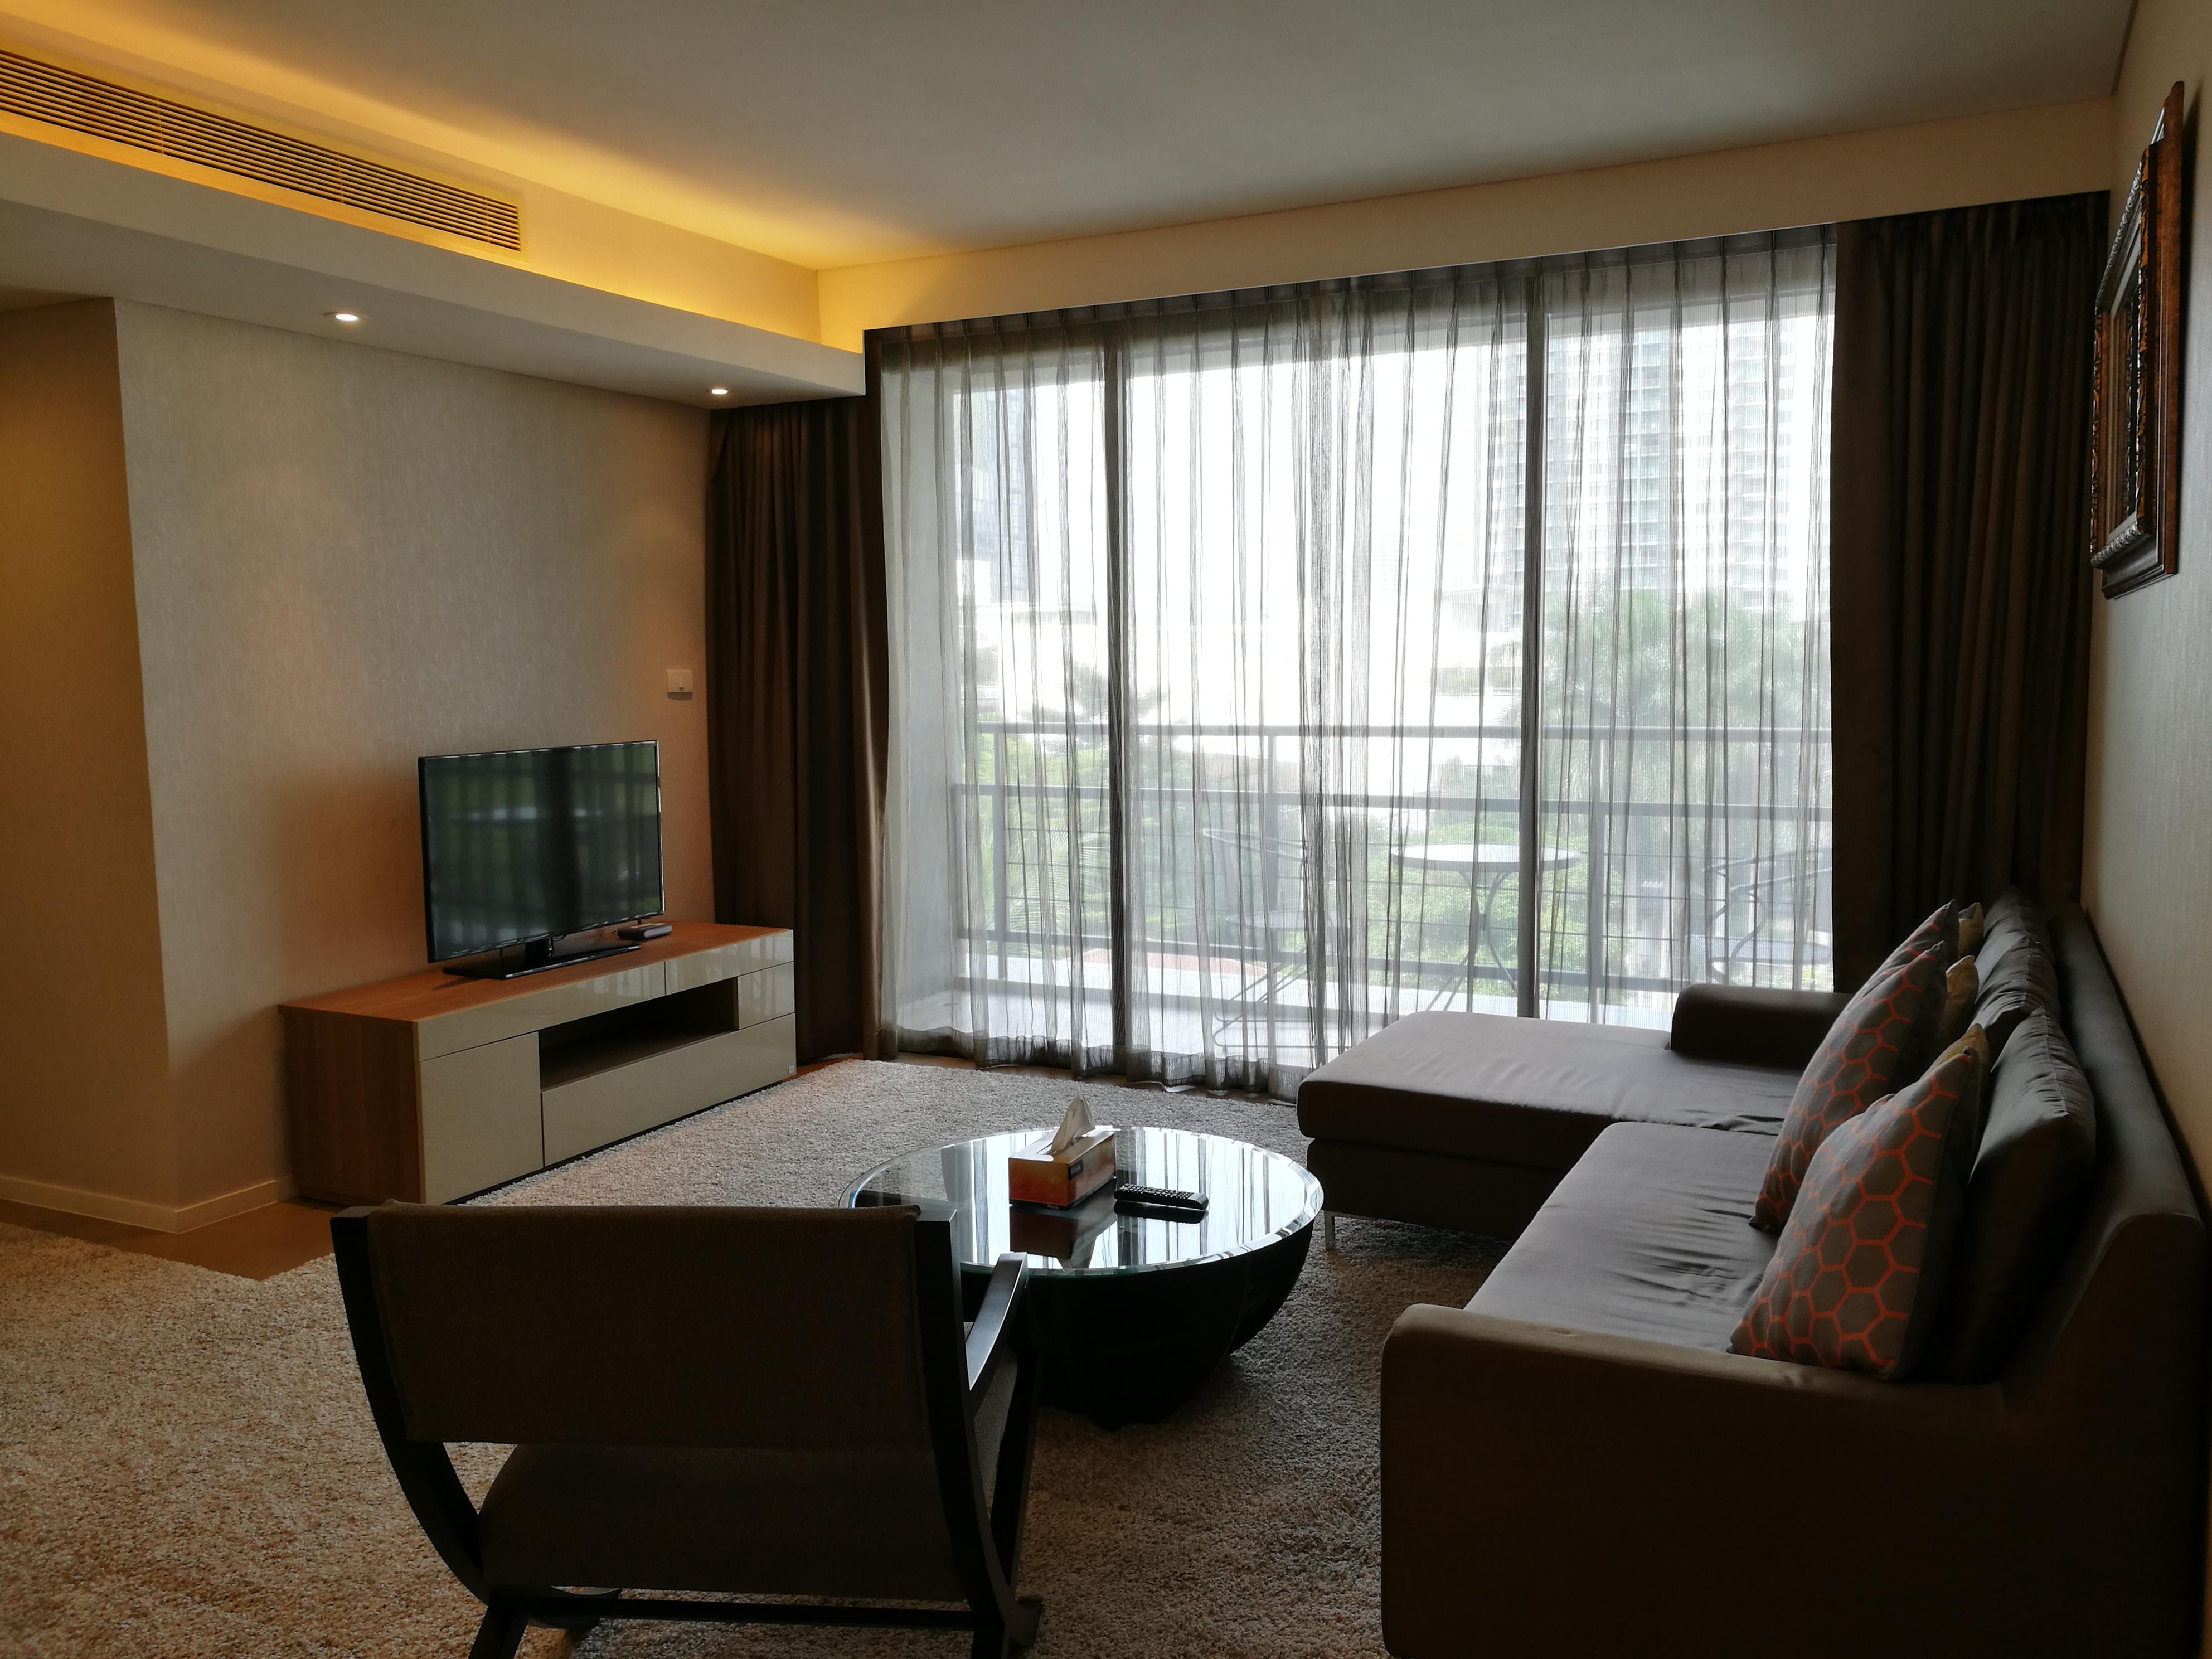 Mode Sukhumvit 61 2 Bedroom Unit For Rent (Located Between Thong Lor And Ekamai BTS)